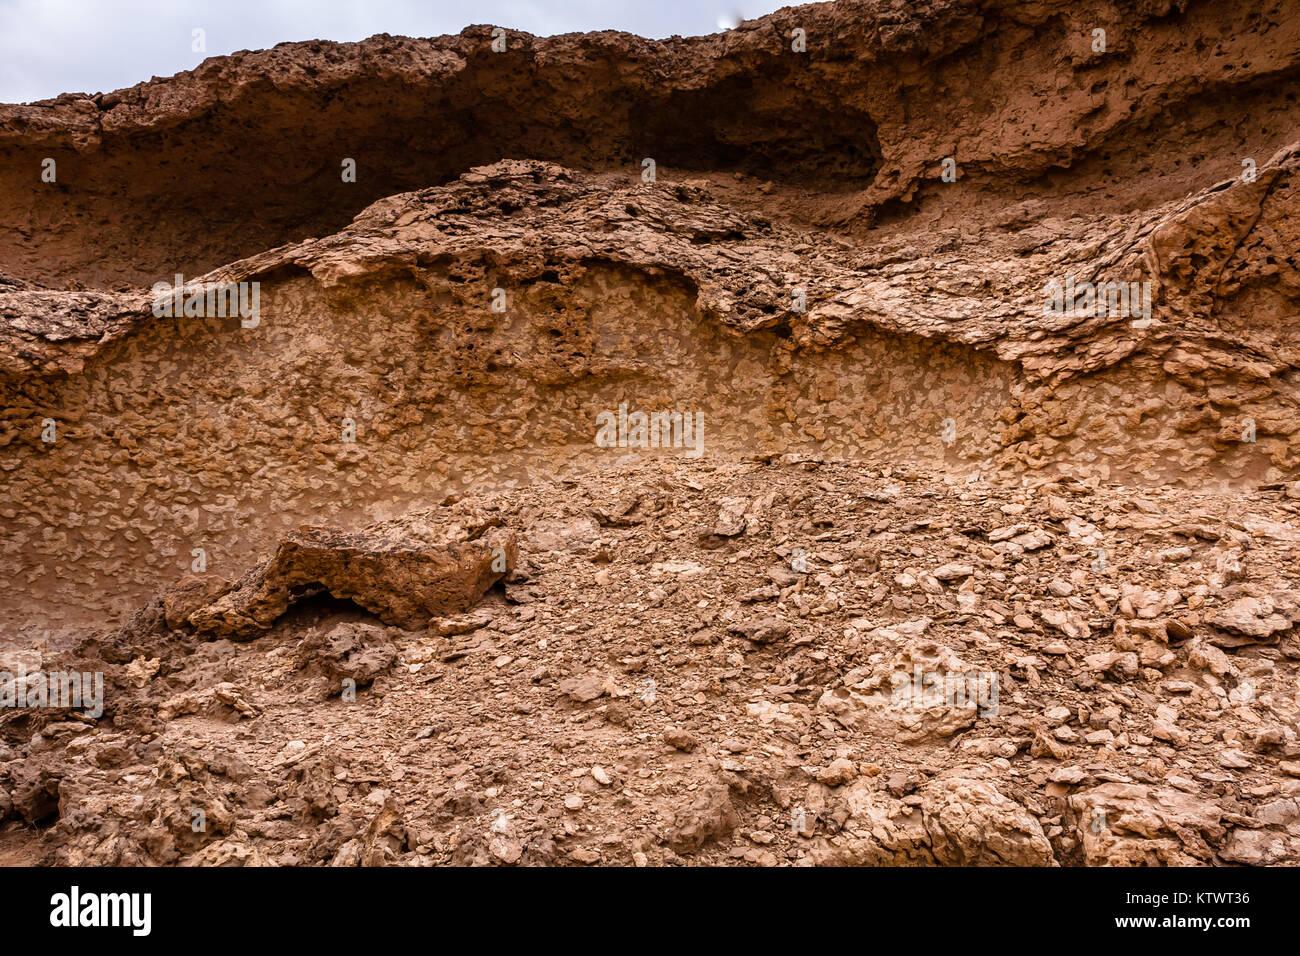 Typical limestone denudation in the desert near Riyadh, Saudi Arabia Stock Photo